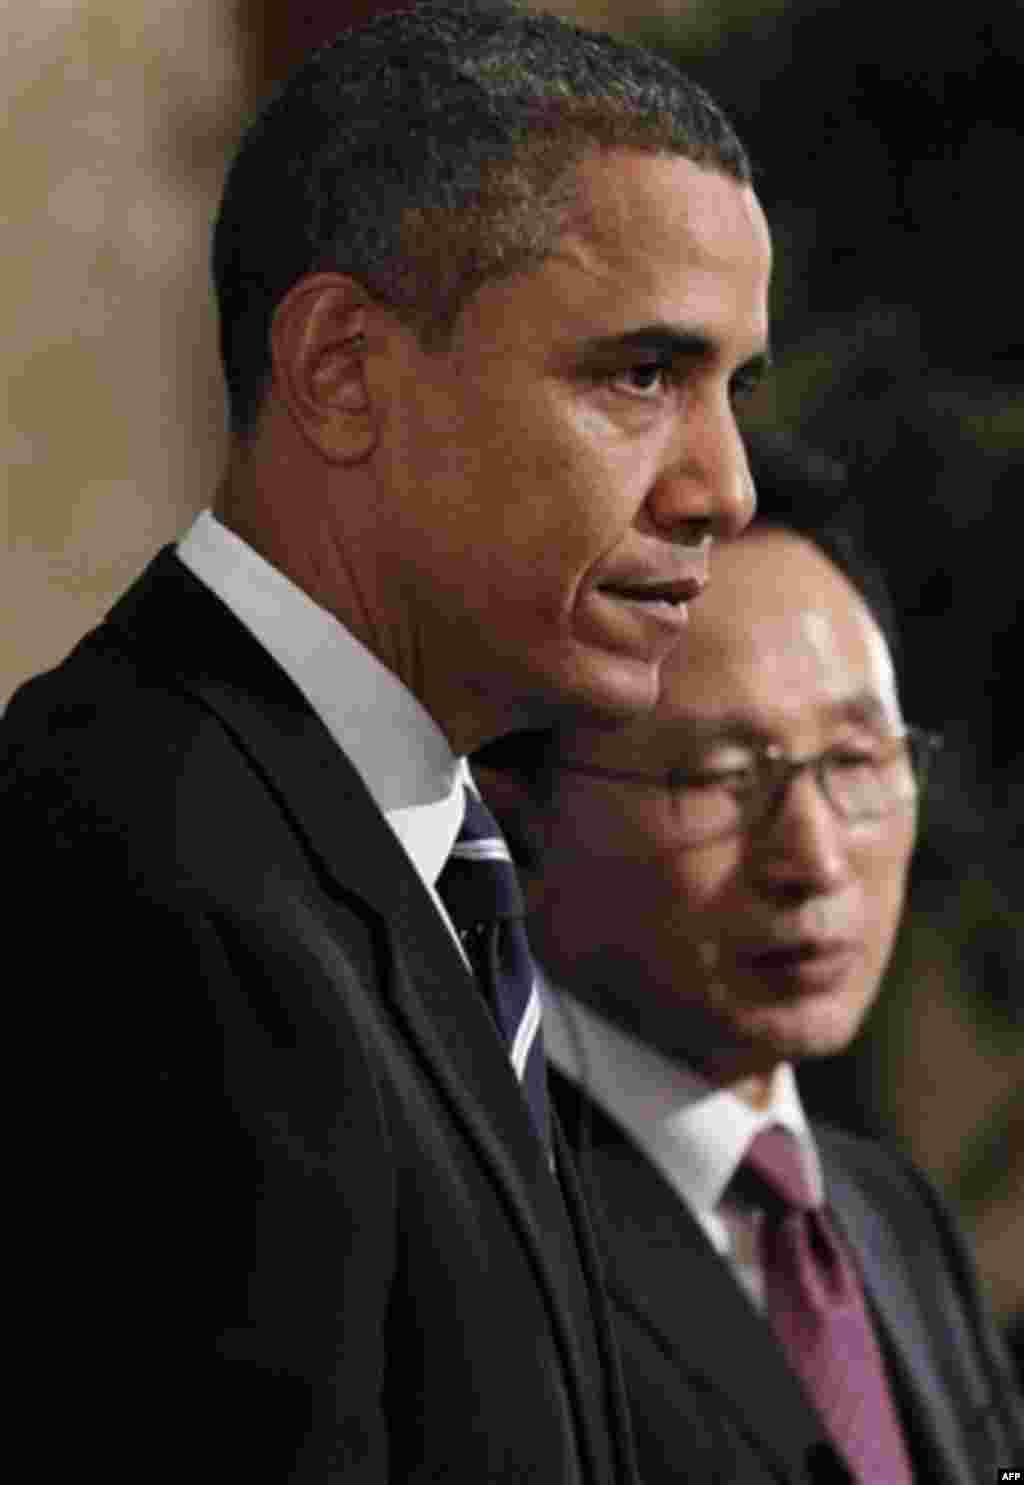 President Barack Obama and South Korean President Lee Myung-bak hold a joint news conference at Blue House in Seoul, South Korea, Thursday, Nov. 11, 2010. (AP Photo/Charles Dharapak)